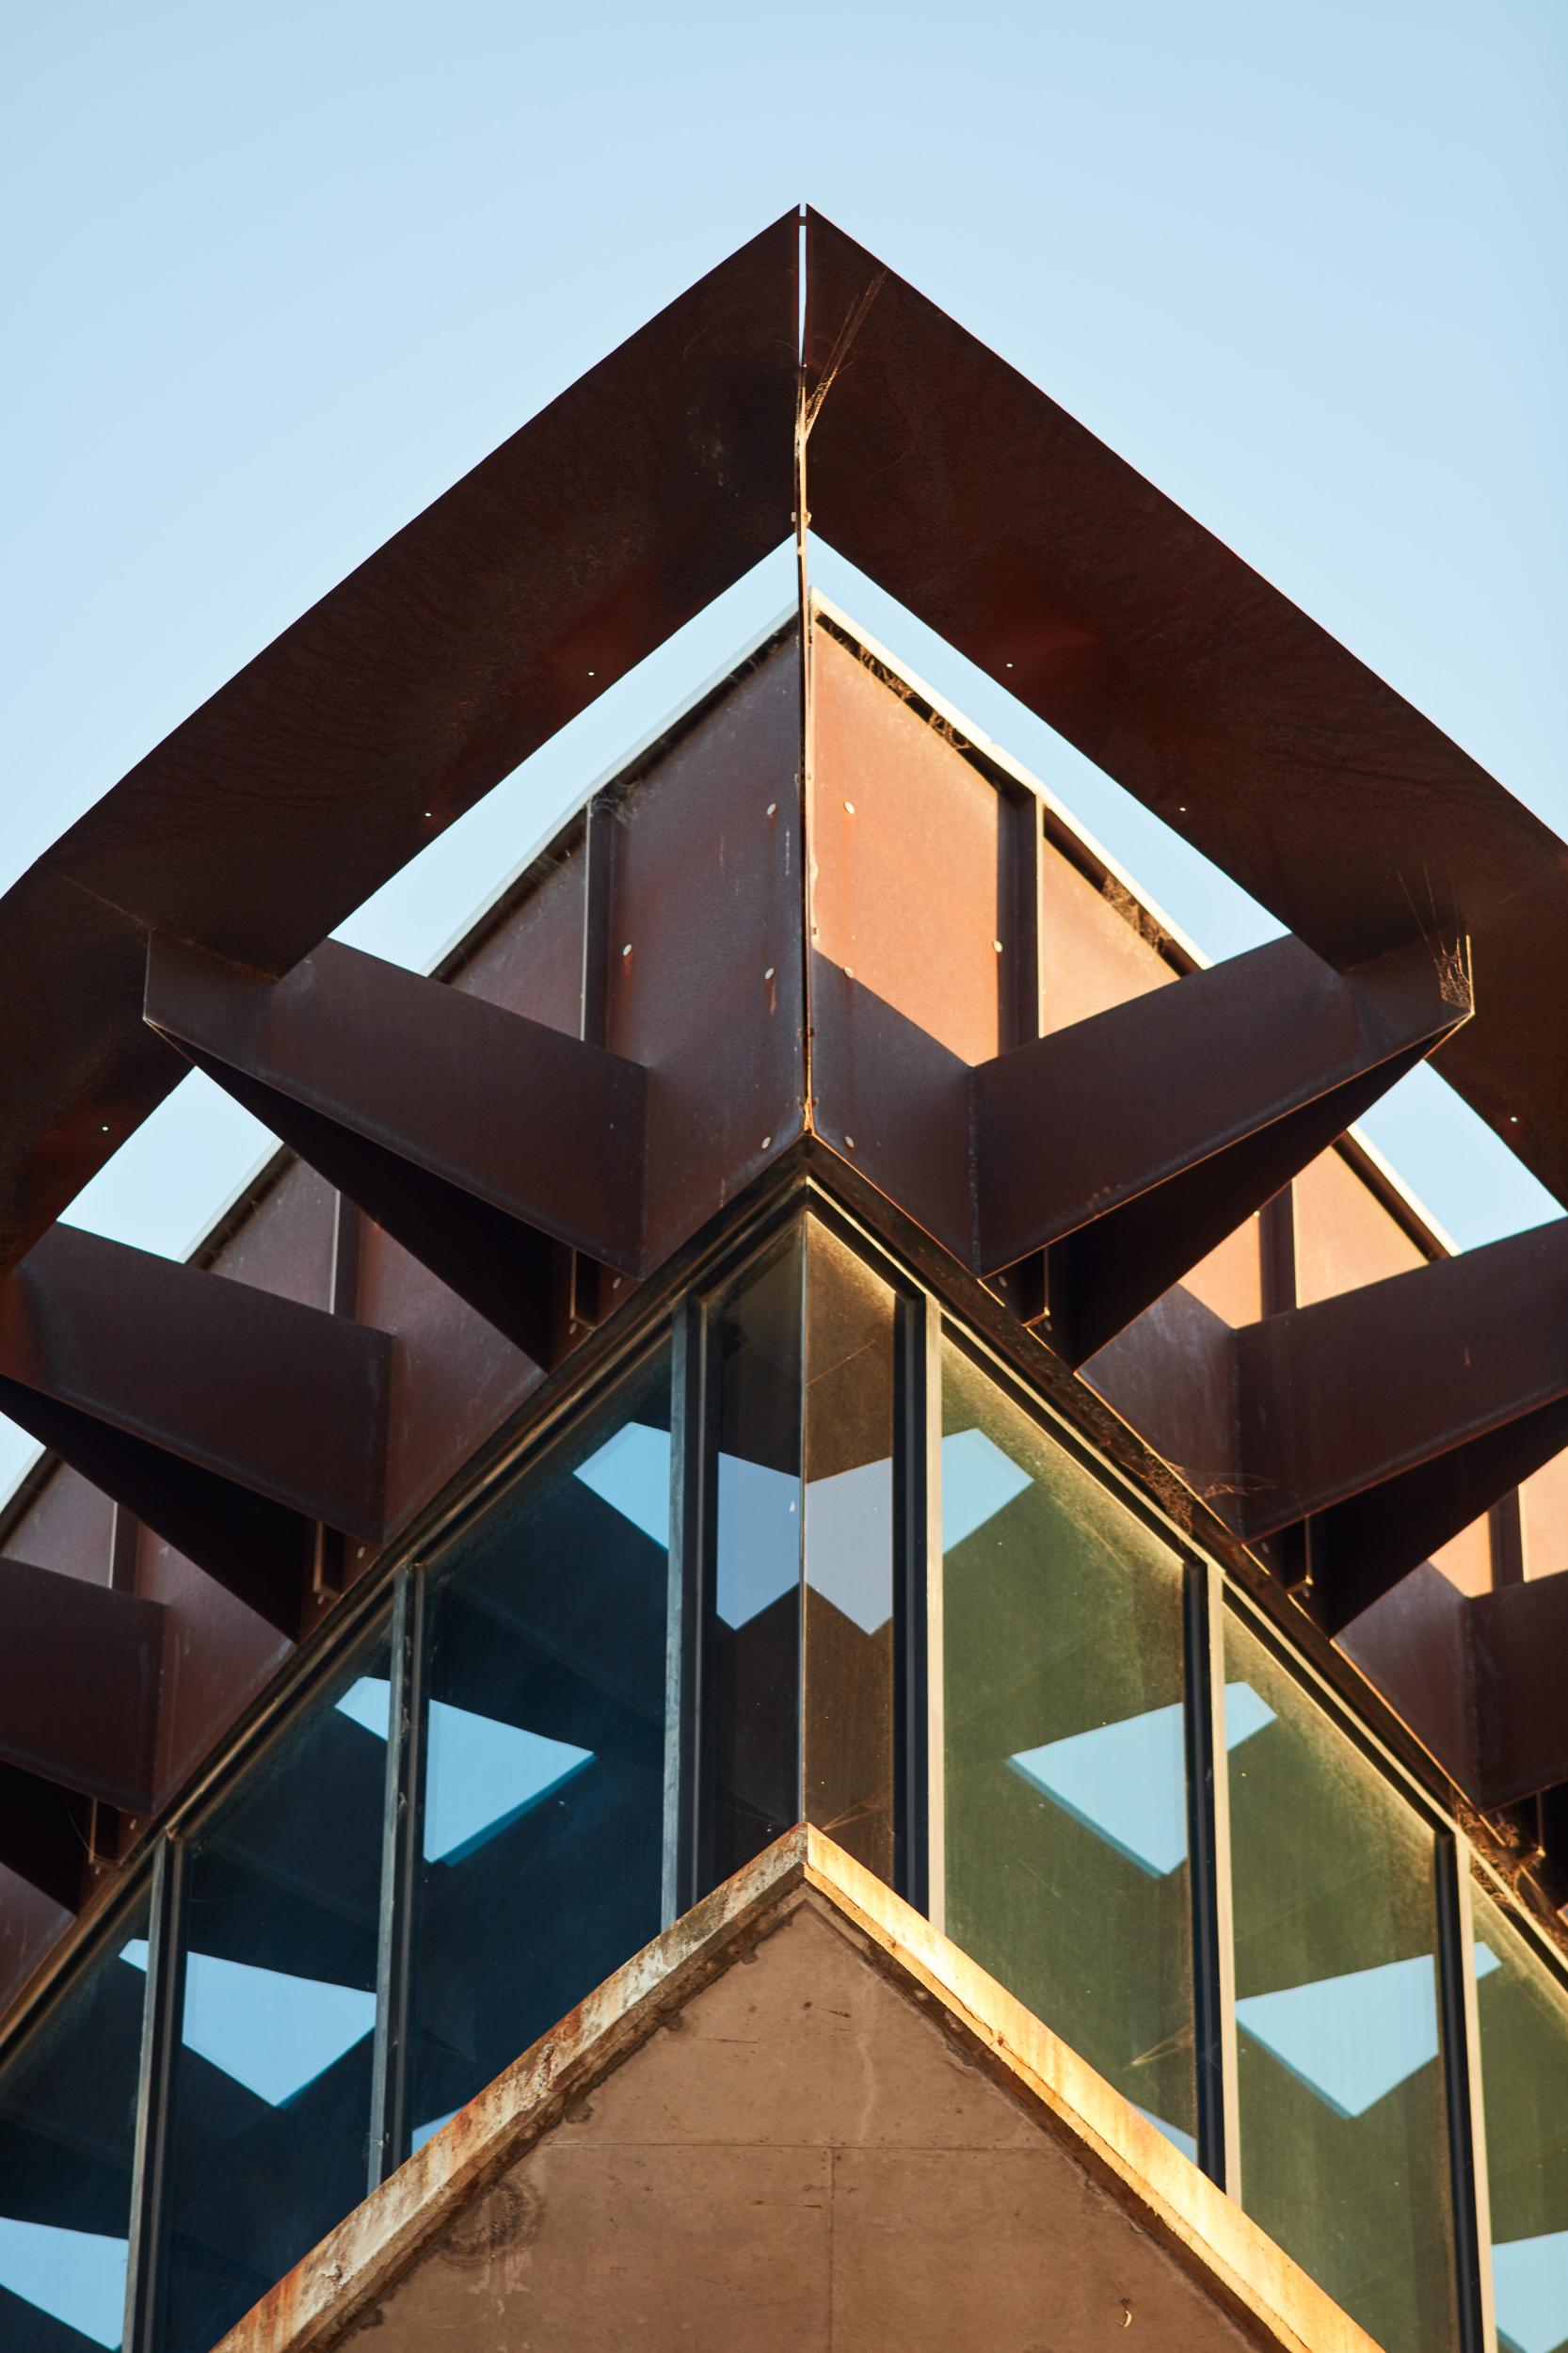 nathankdavis-nathan-k-davis-1nkd-architecture-architectural-photography-interior-exterior-design-real-estate-richmond-abinger-st-street-melbourne-17